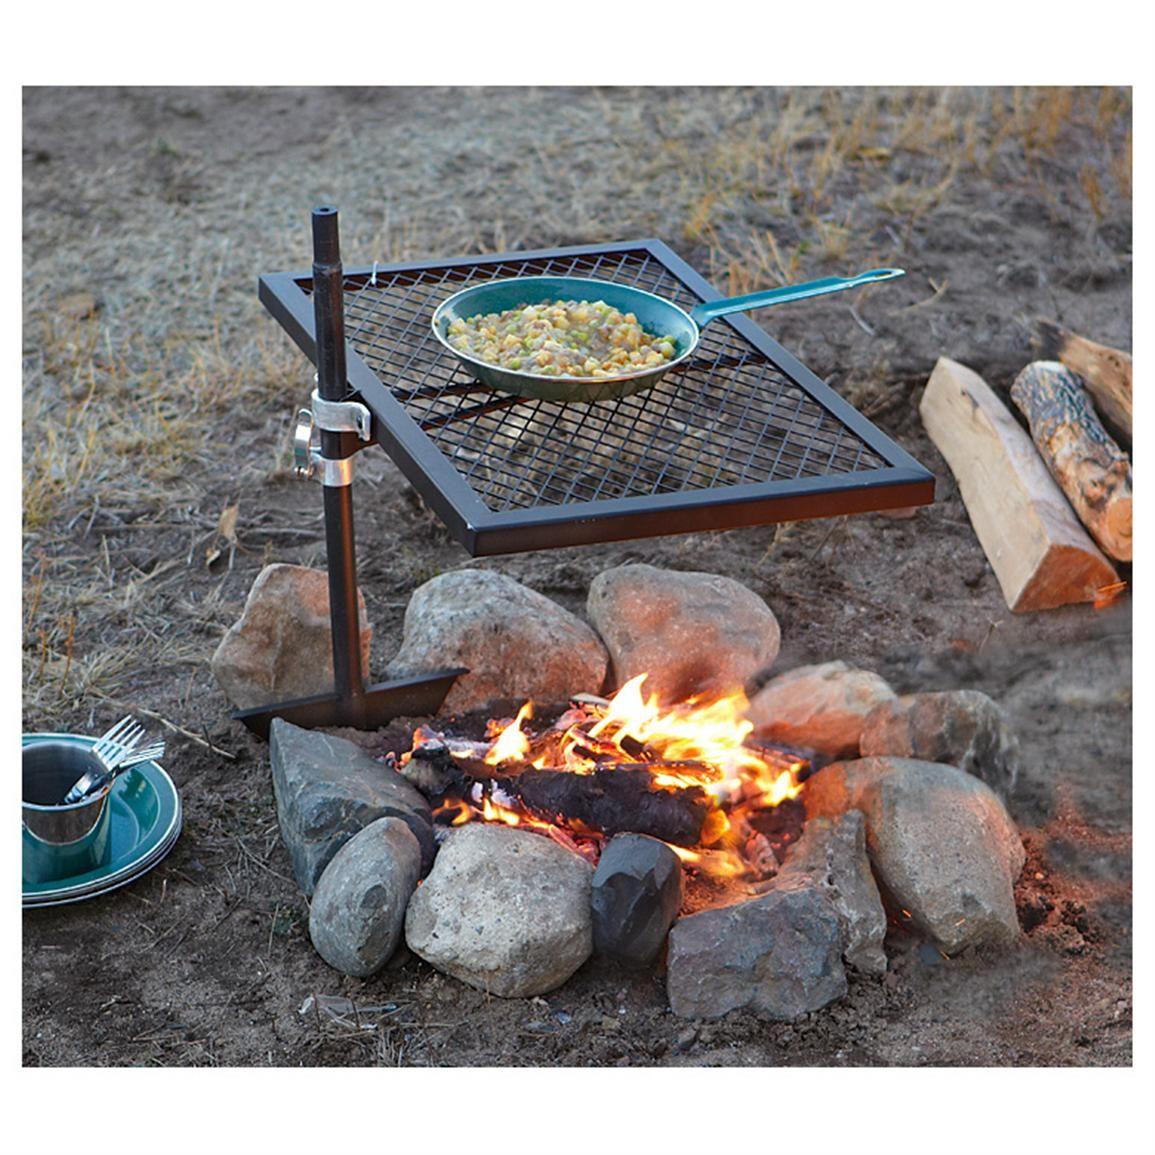 Guide Gear Swivel Fire Pit Grill 25 Homemade Fire Pit Fire